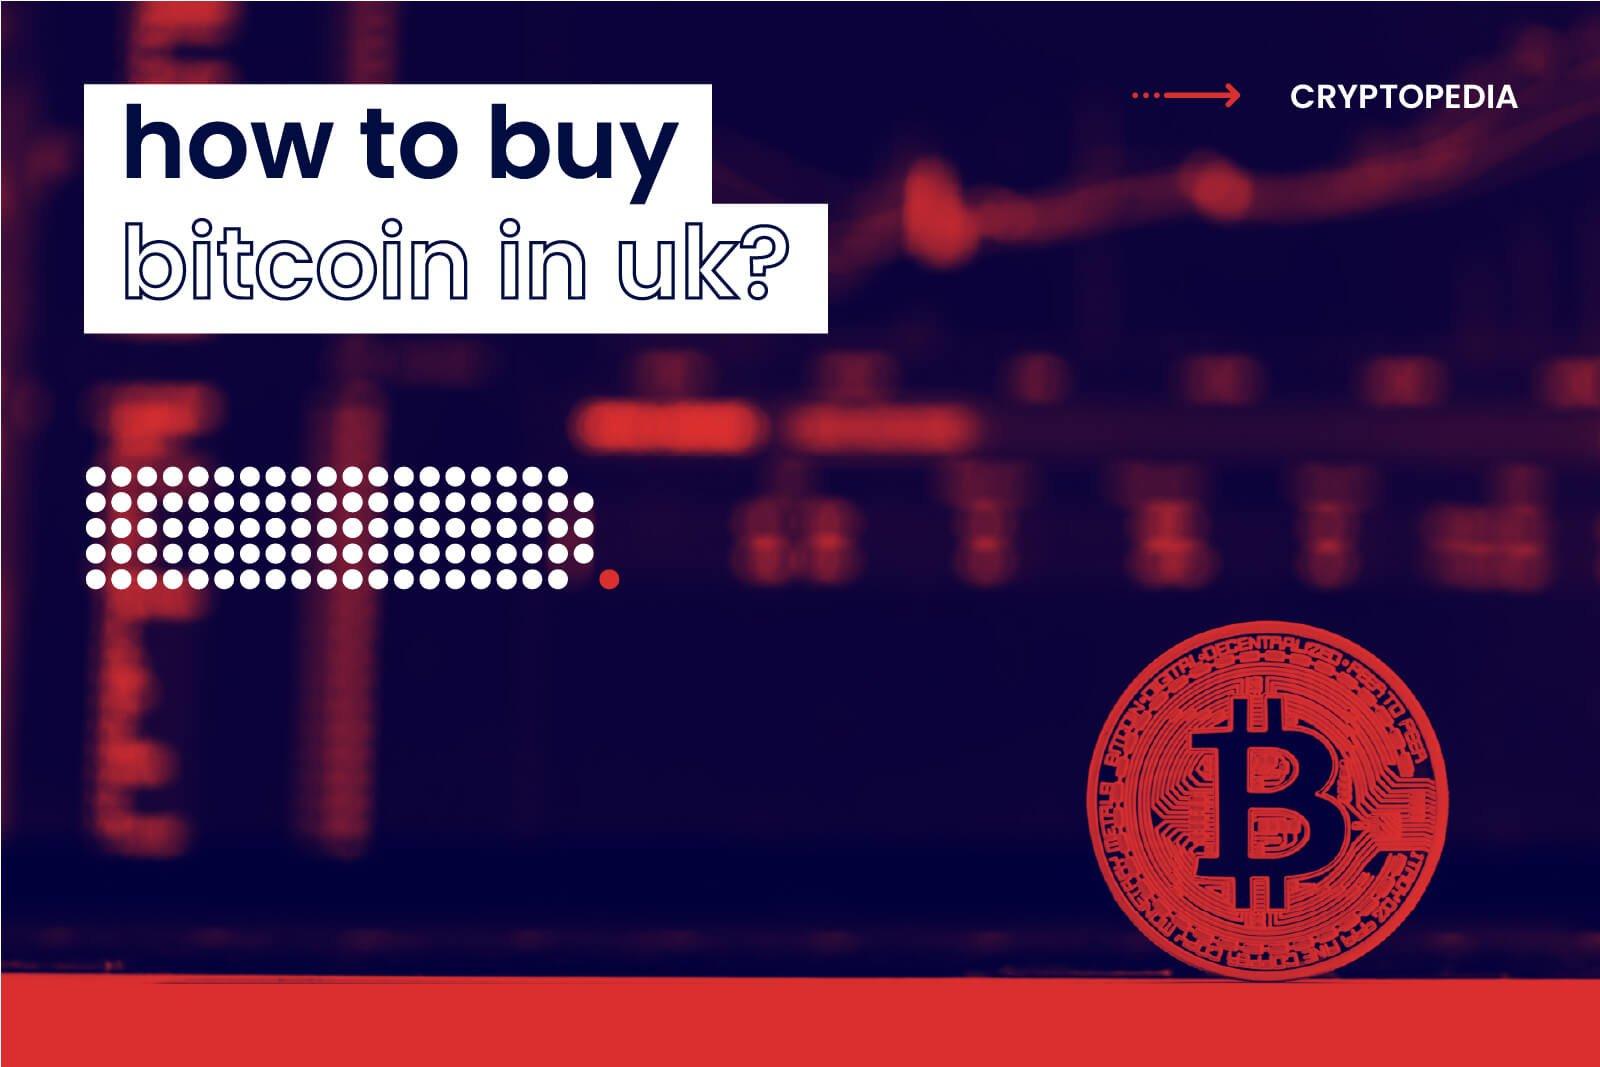 How to buy Bitcoin UK